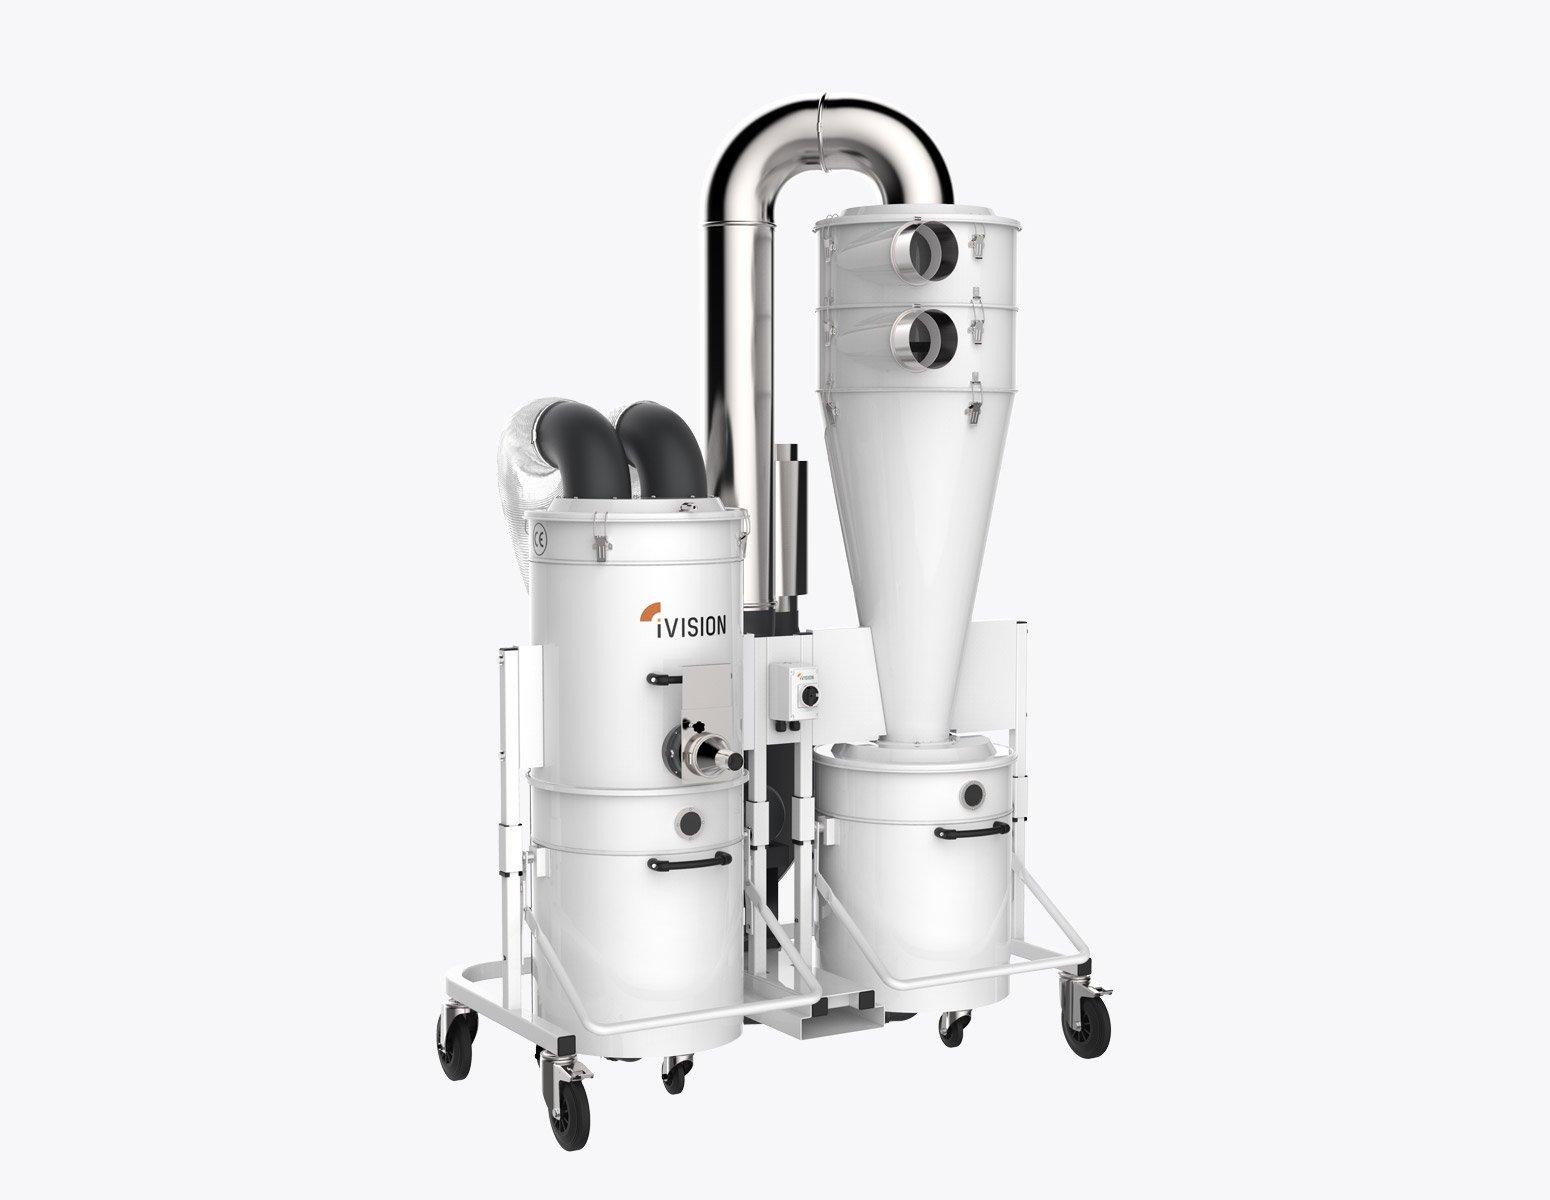 iv-custom-shoes-line-industrial-vacuum-cleaners-ivision-vacuum